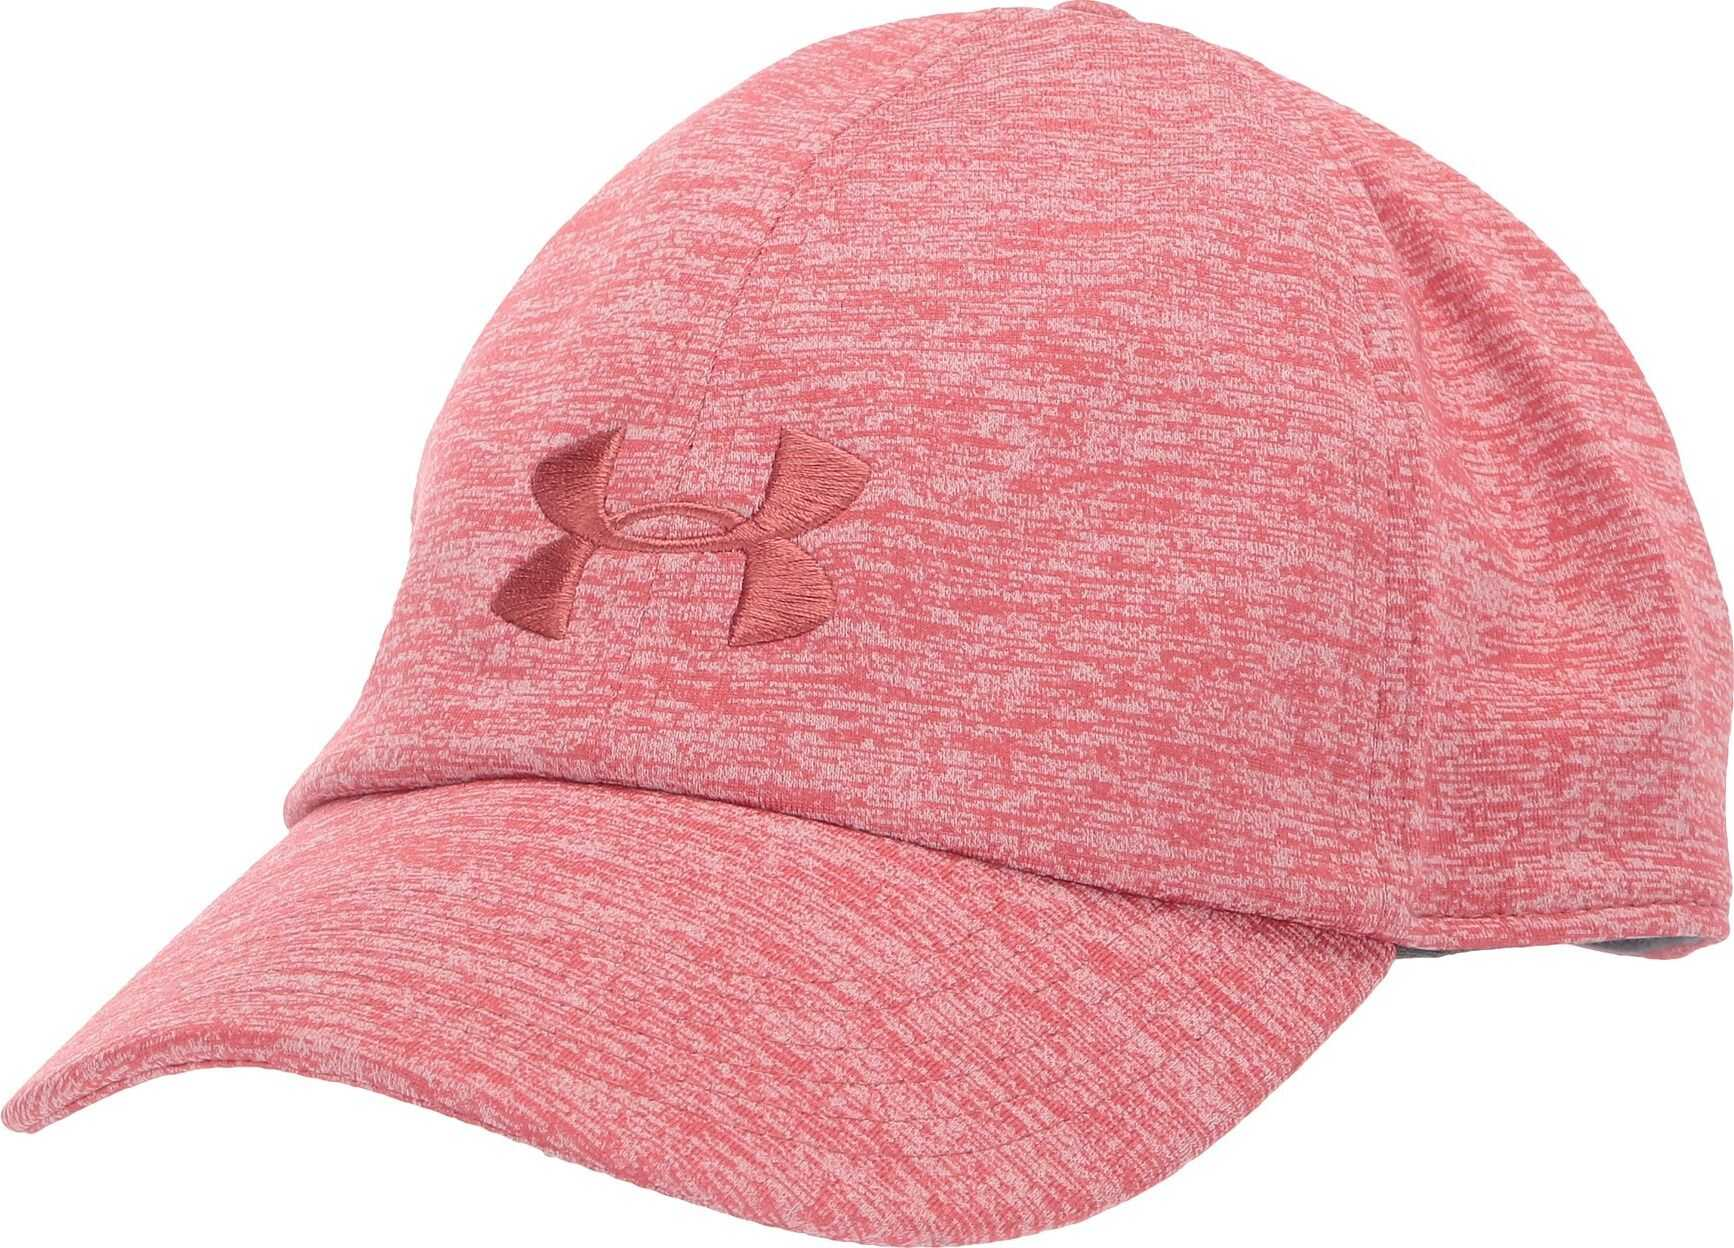 Under Armour UA Twisted Renegade Cap Fractal Pink/Fractal Pink/Fractal Pink